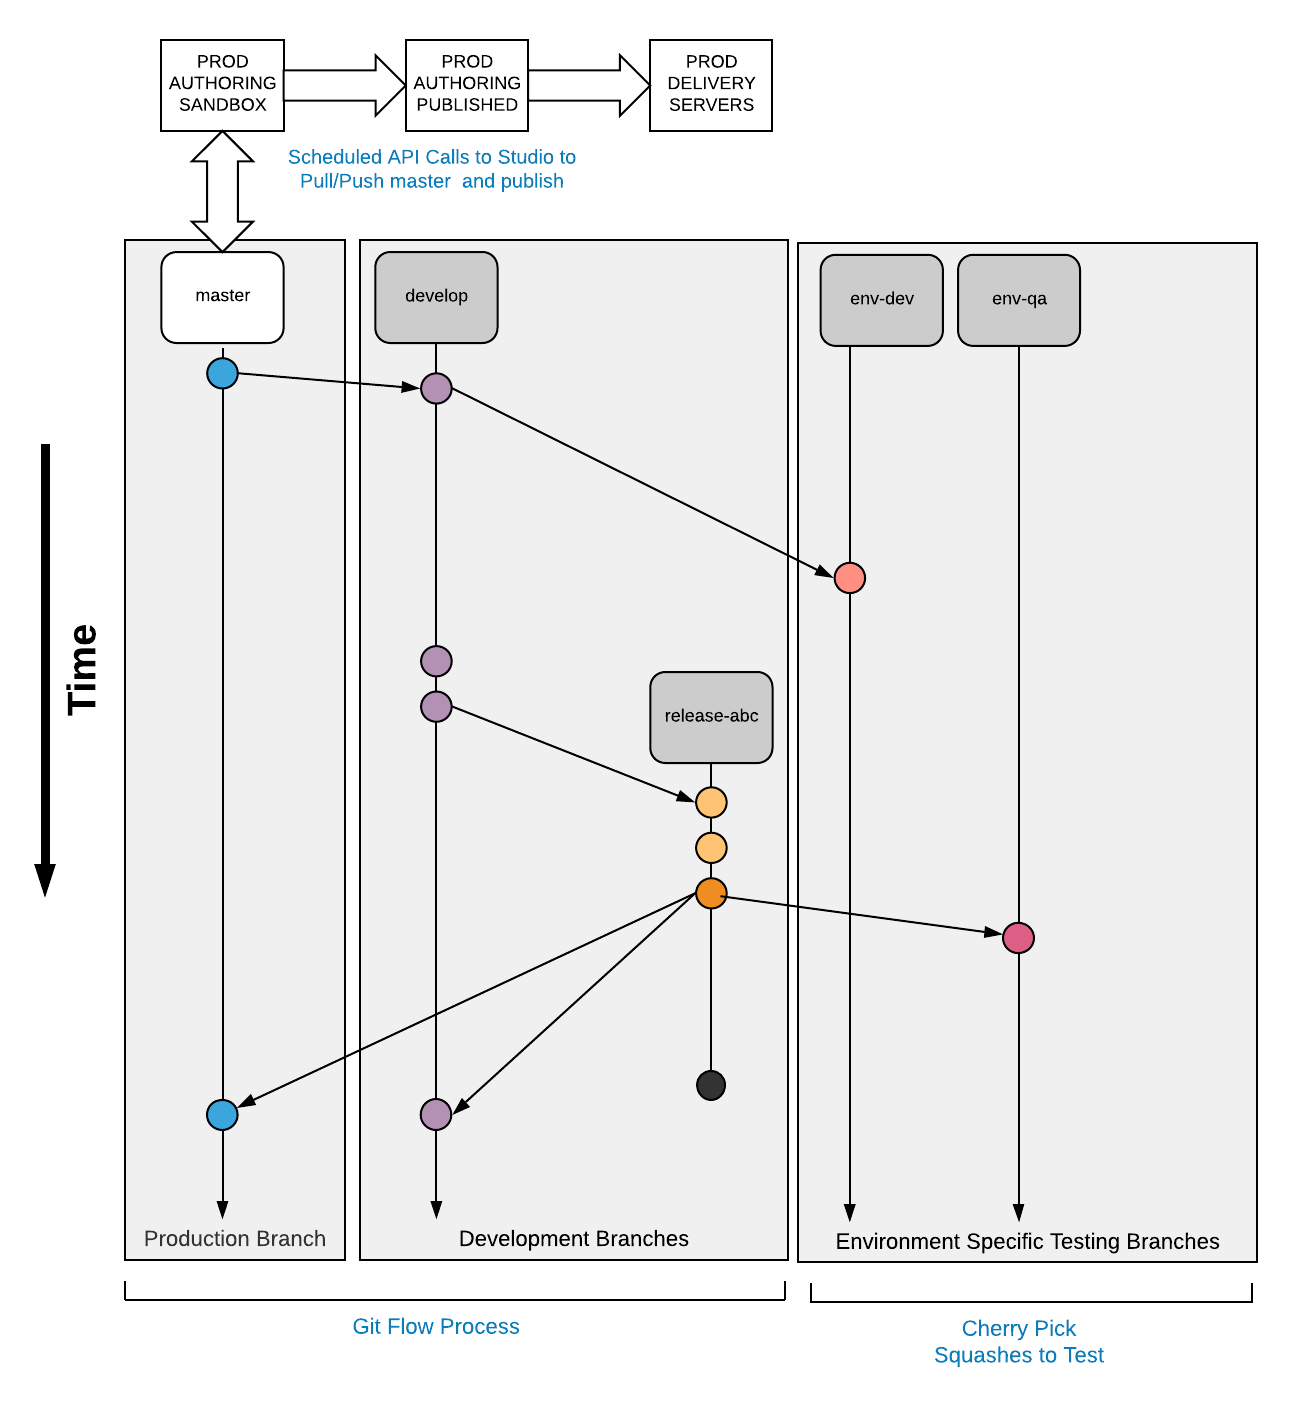 Implementation of the DevOps Workflow [Code Forward